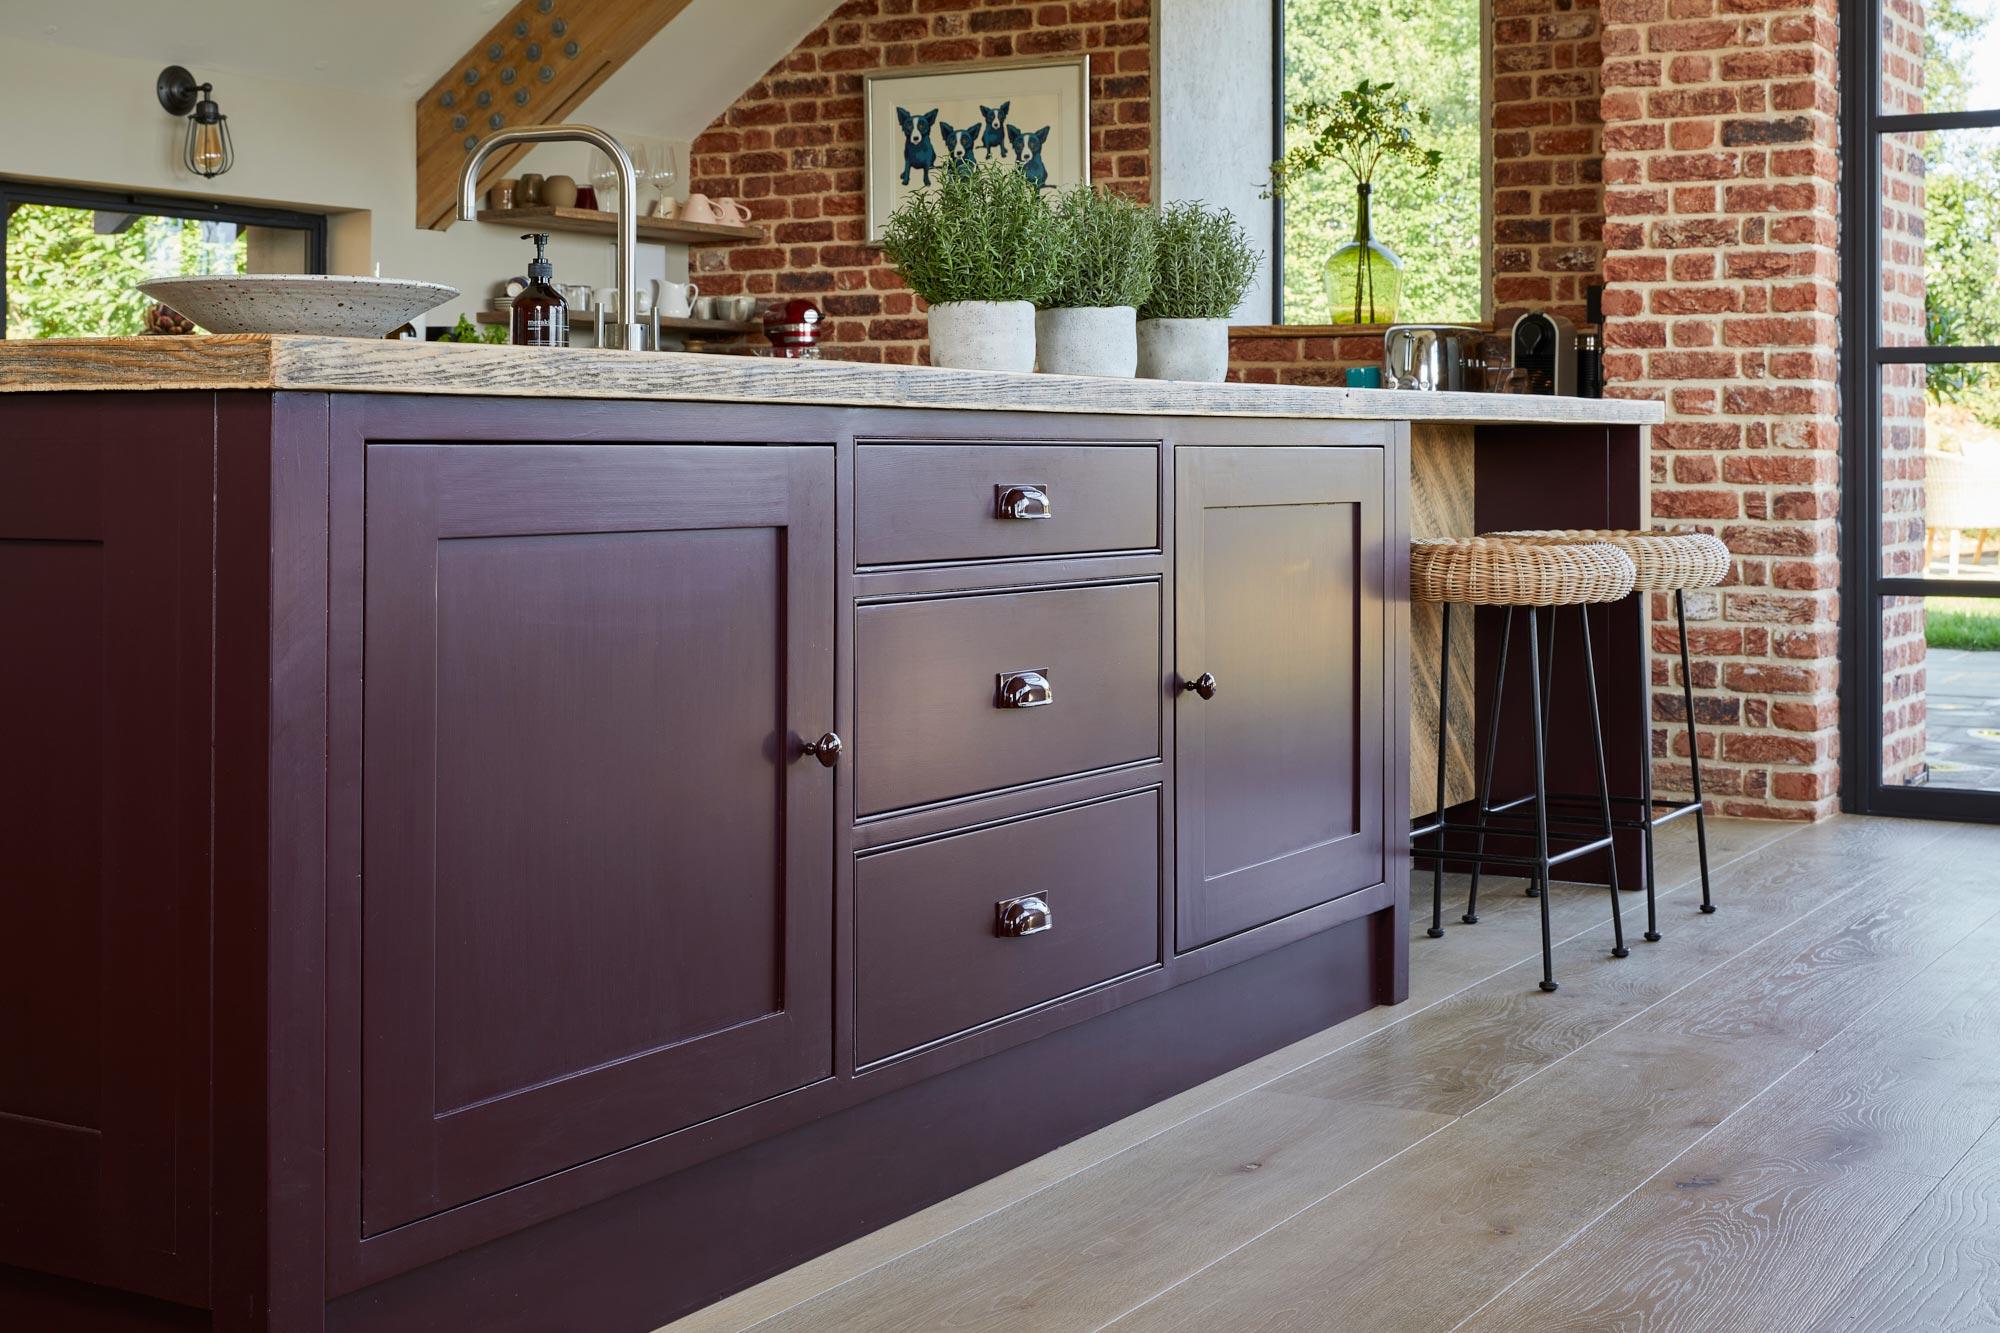 Painted shaker kitchen